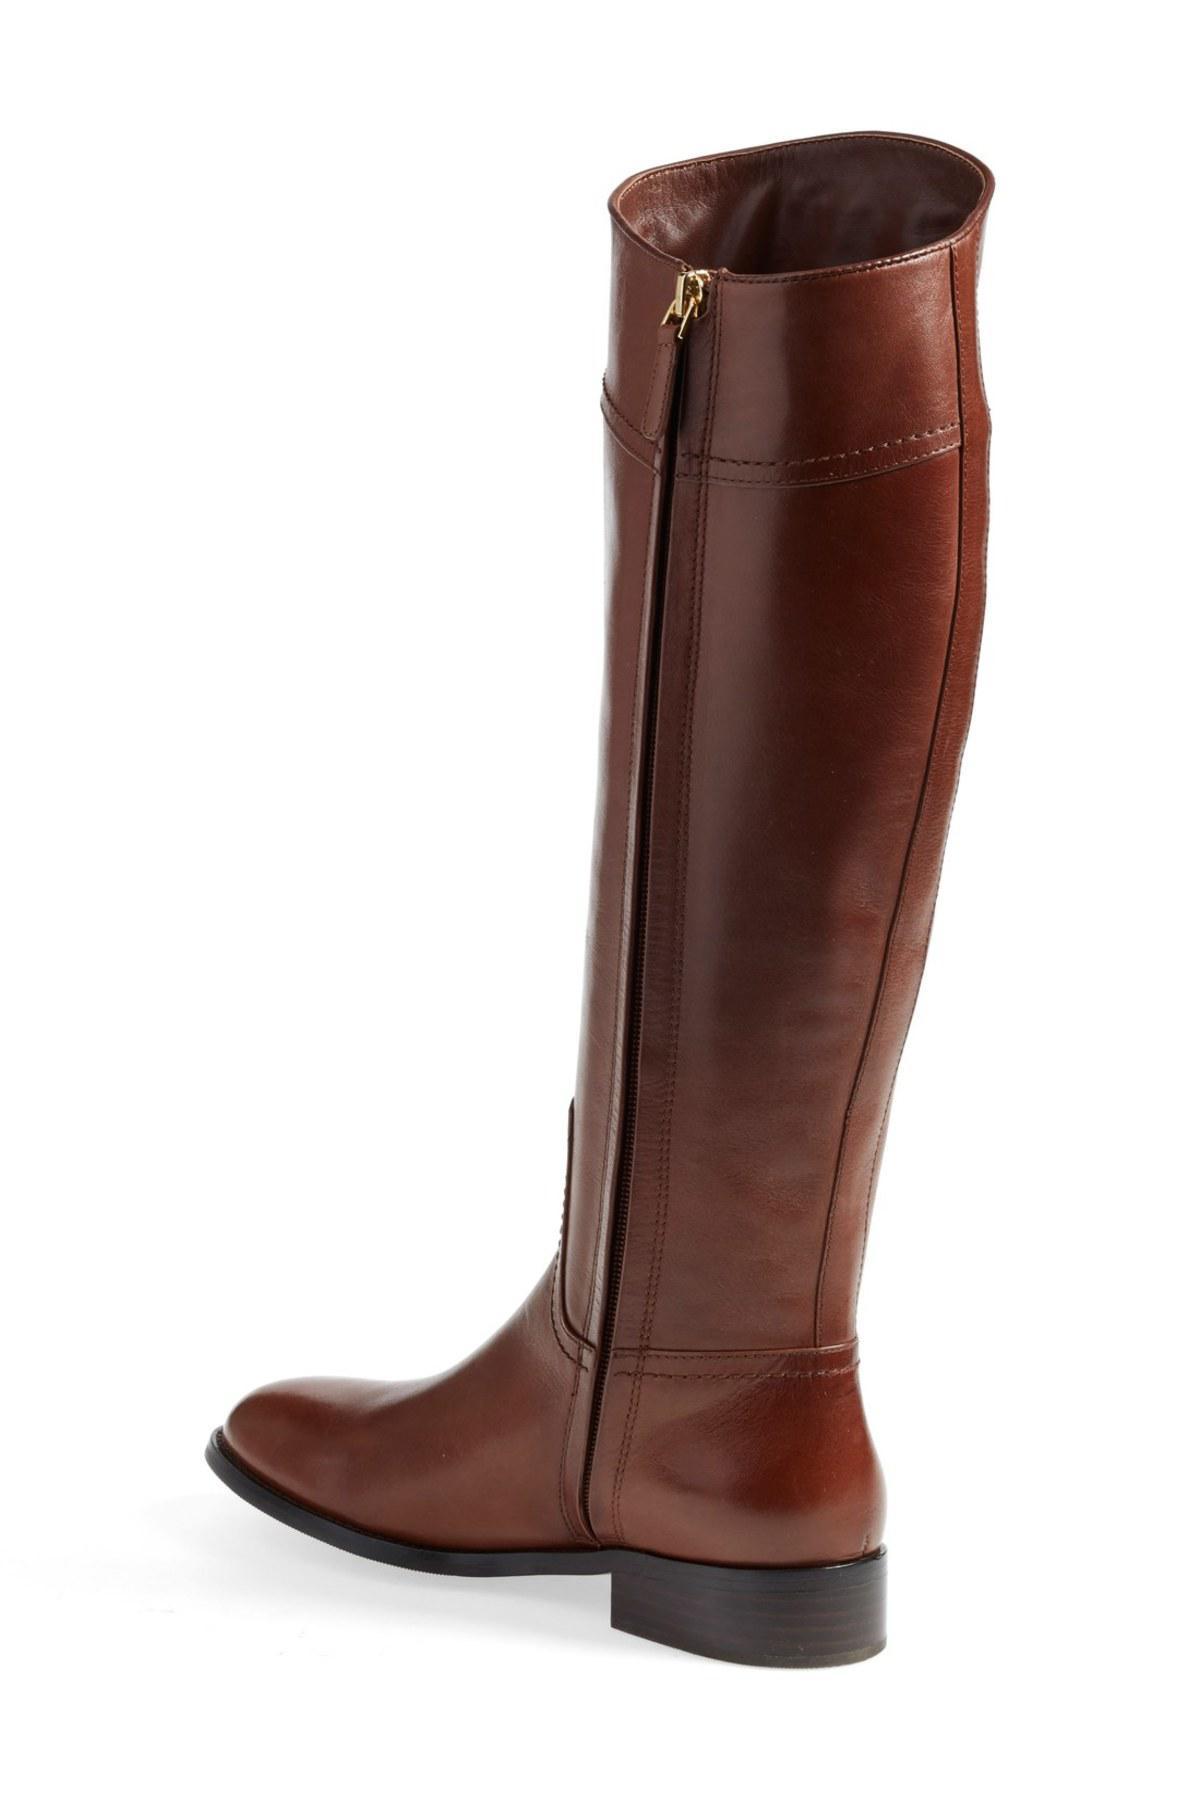 84a9336bd8e4 Lyst - Tory Burch Ashlynn Riding Boot in Brown